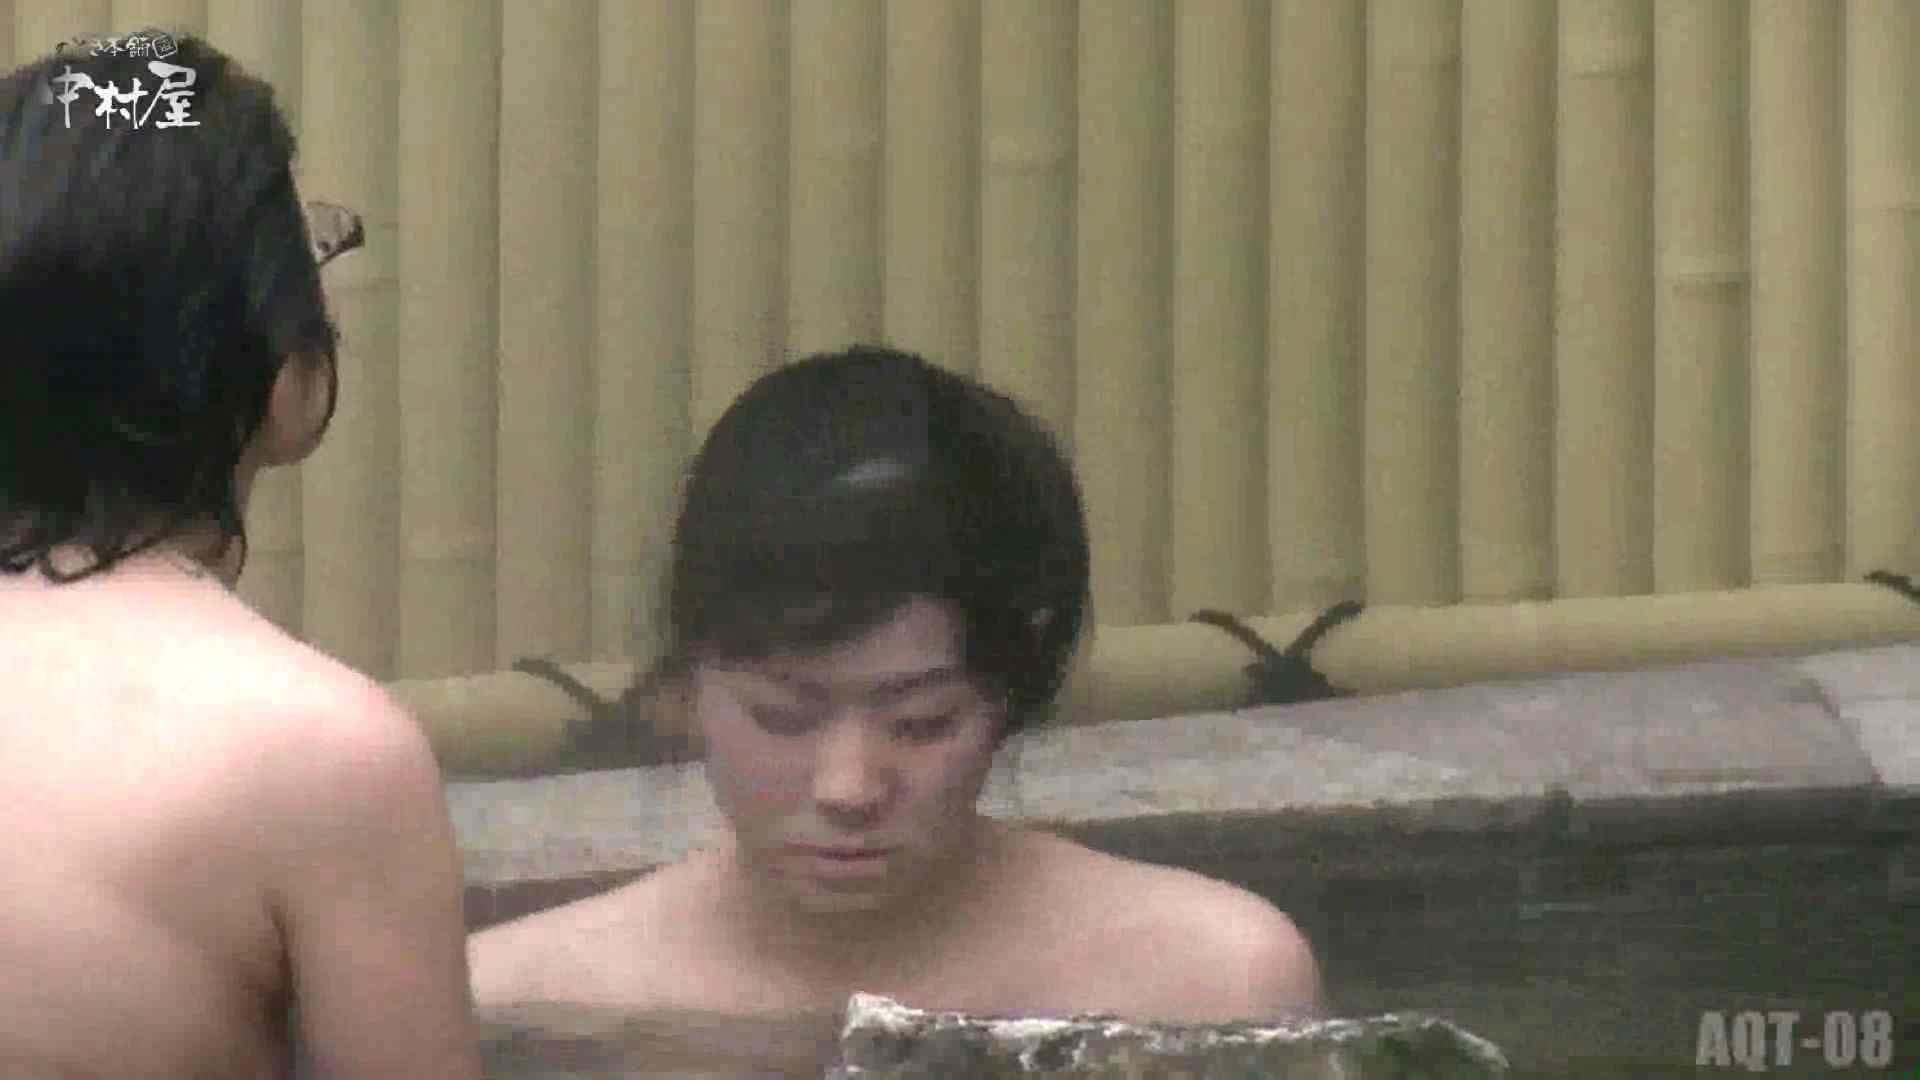 Aquaな露天風呂Vol.872潜入盗撮露天風呂八判湯 其の二 露天風呂 | 潜入  70連発 53